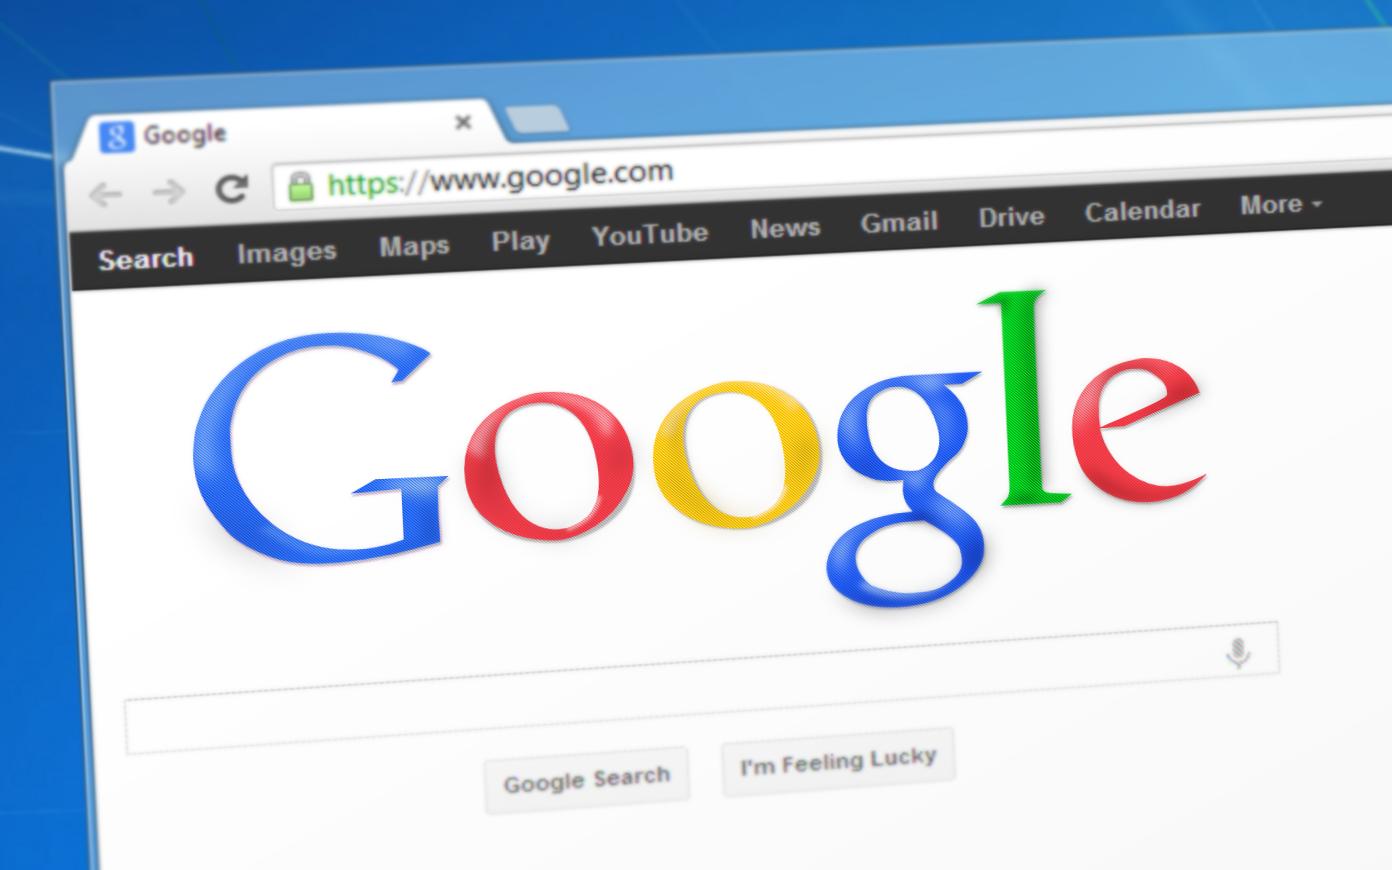 como buscar personas por internet web español españa encontrar buscar internet 2017